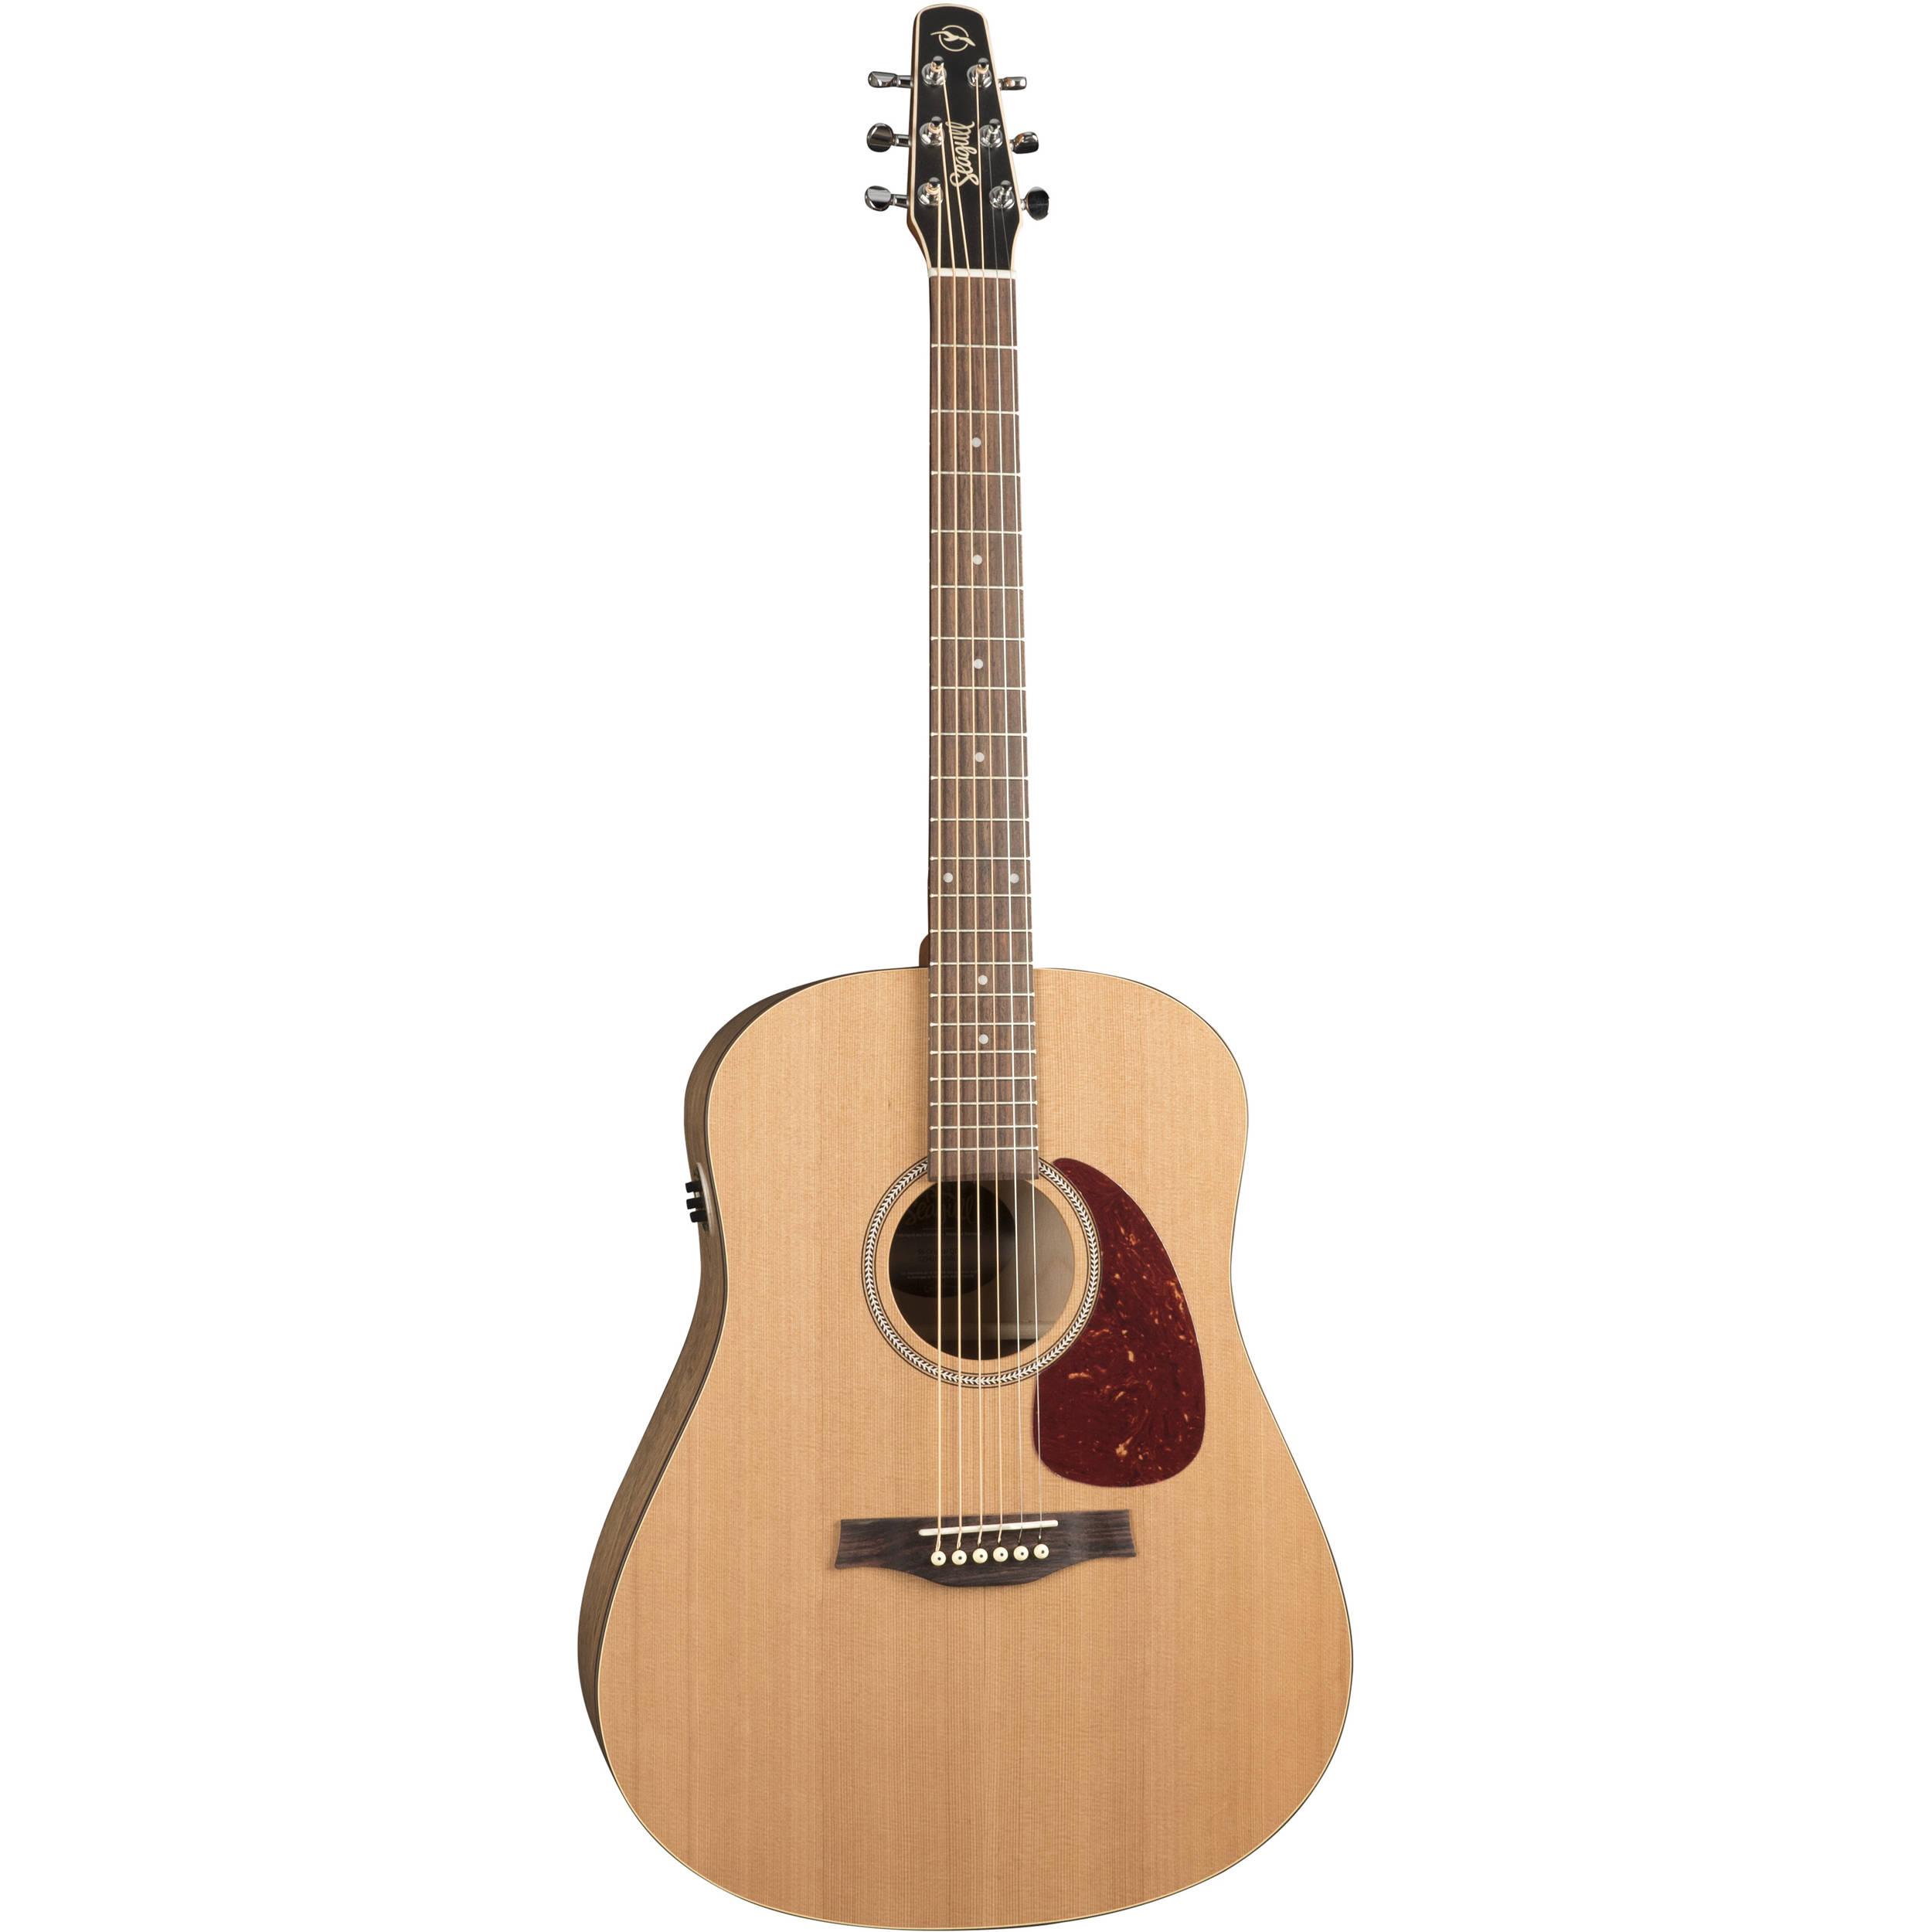 seagull guitars s6 original slim qit acoustic electric 046416. Black Bedroom Furniture Sets. Home Design Ideas